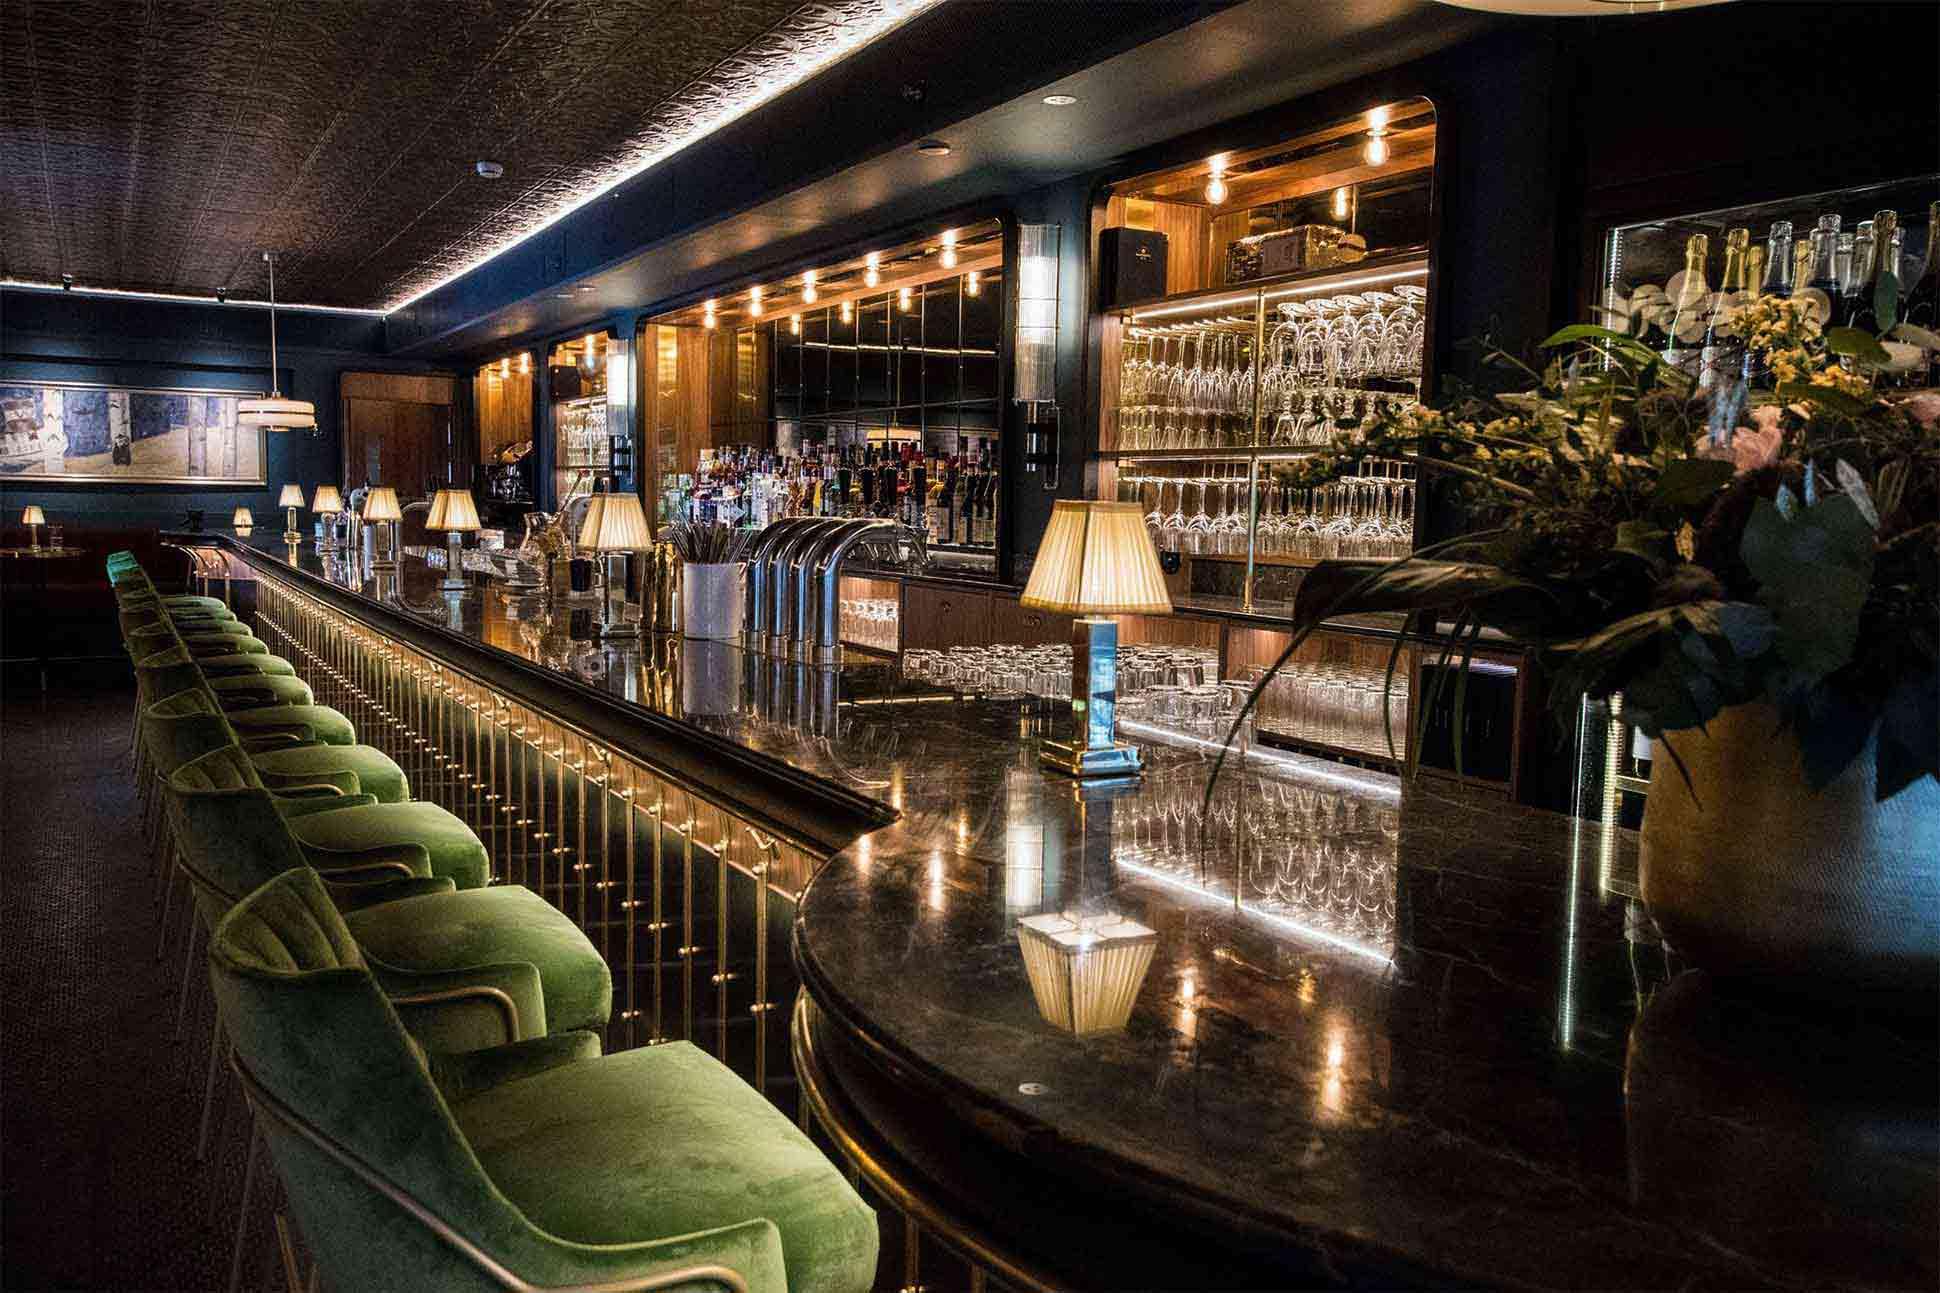 Watsons' Bar at Hotel Rival, Stockholm, Sweden